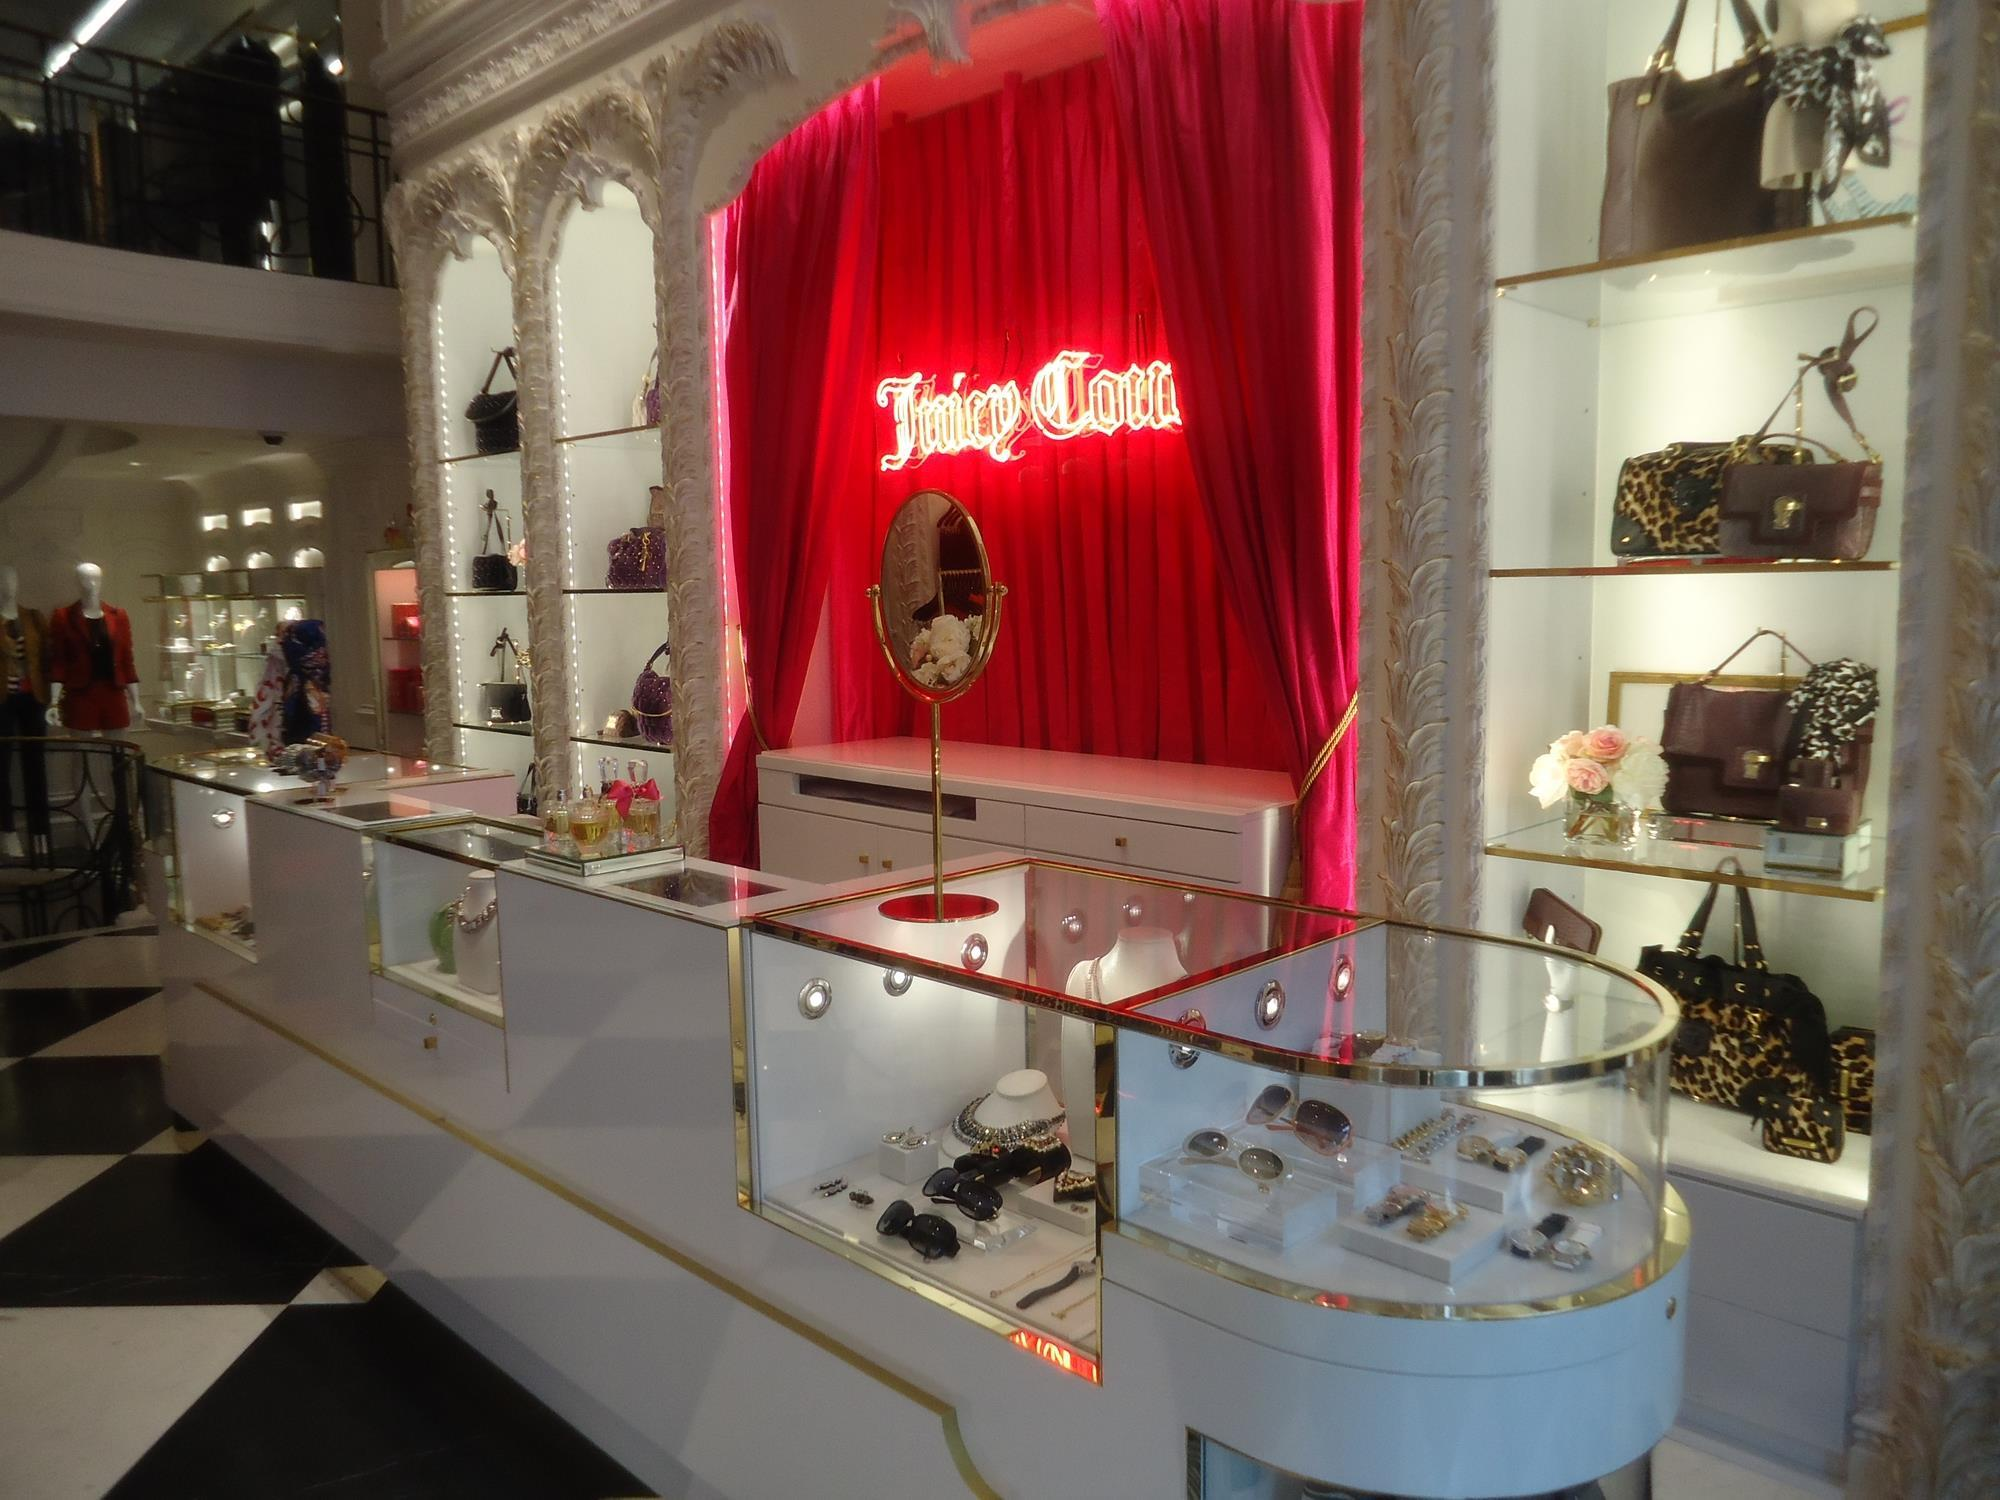 538da9f42ca0 Store of the week: Juicy Couture, Regent Street, London | Photo gallery |  Retail Week